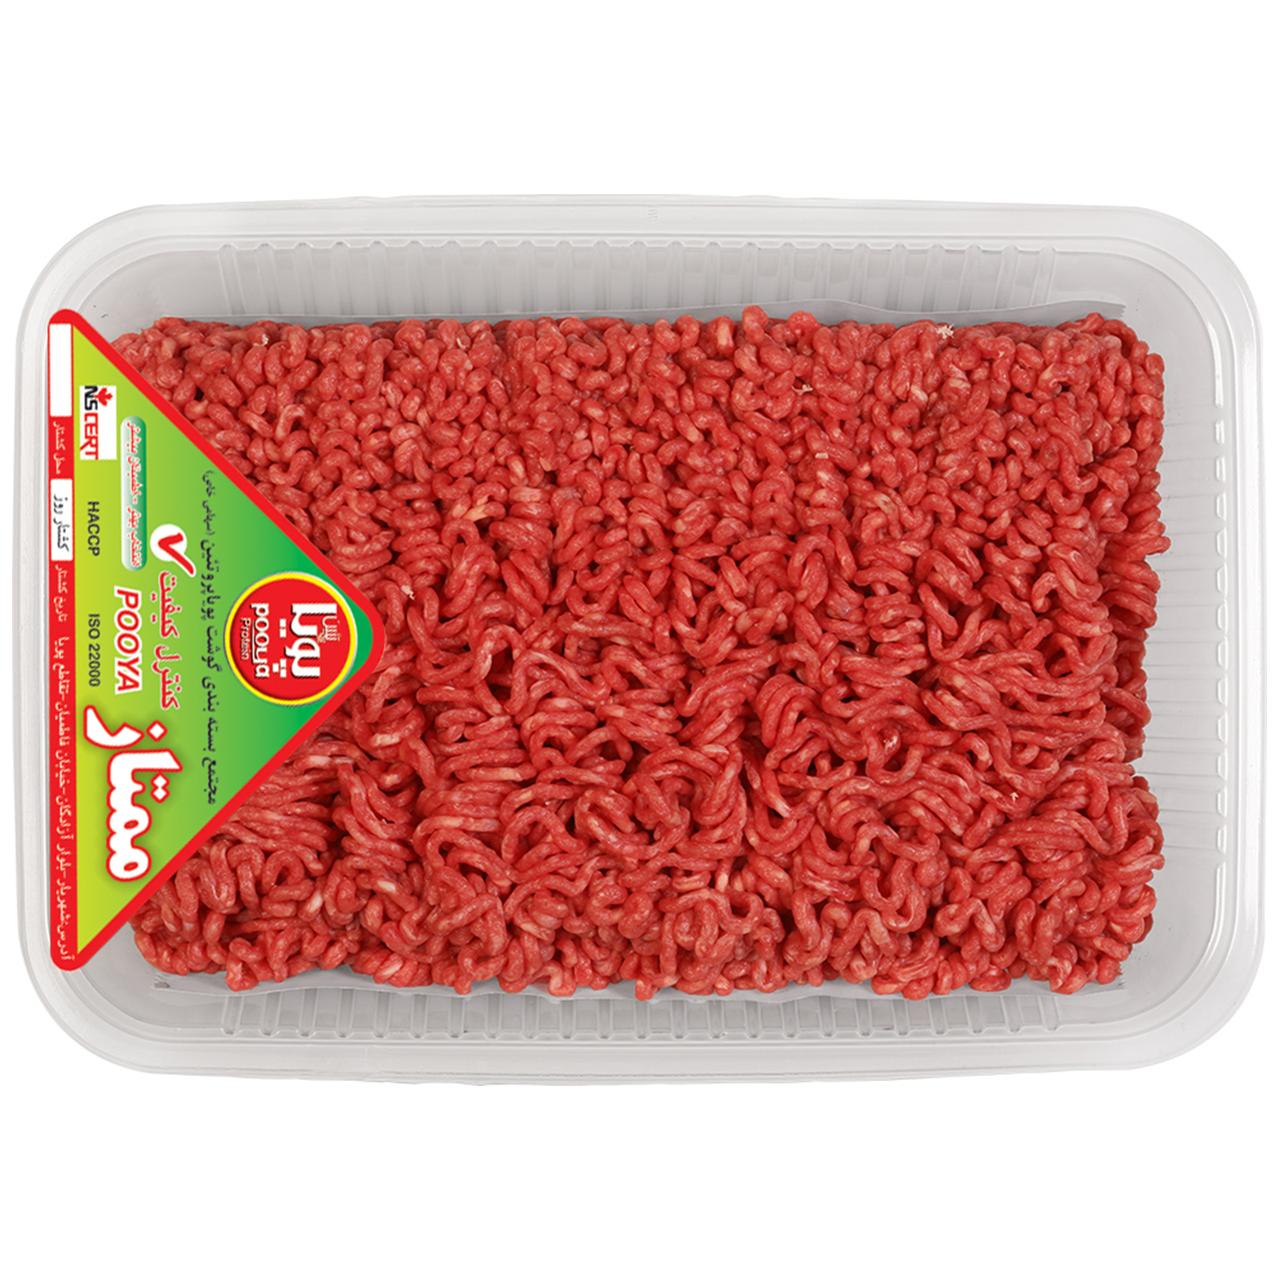 گوشت چرخ کرده مخلوط پویا پروتئین وزن 500 گرم thumb